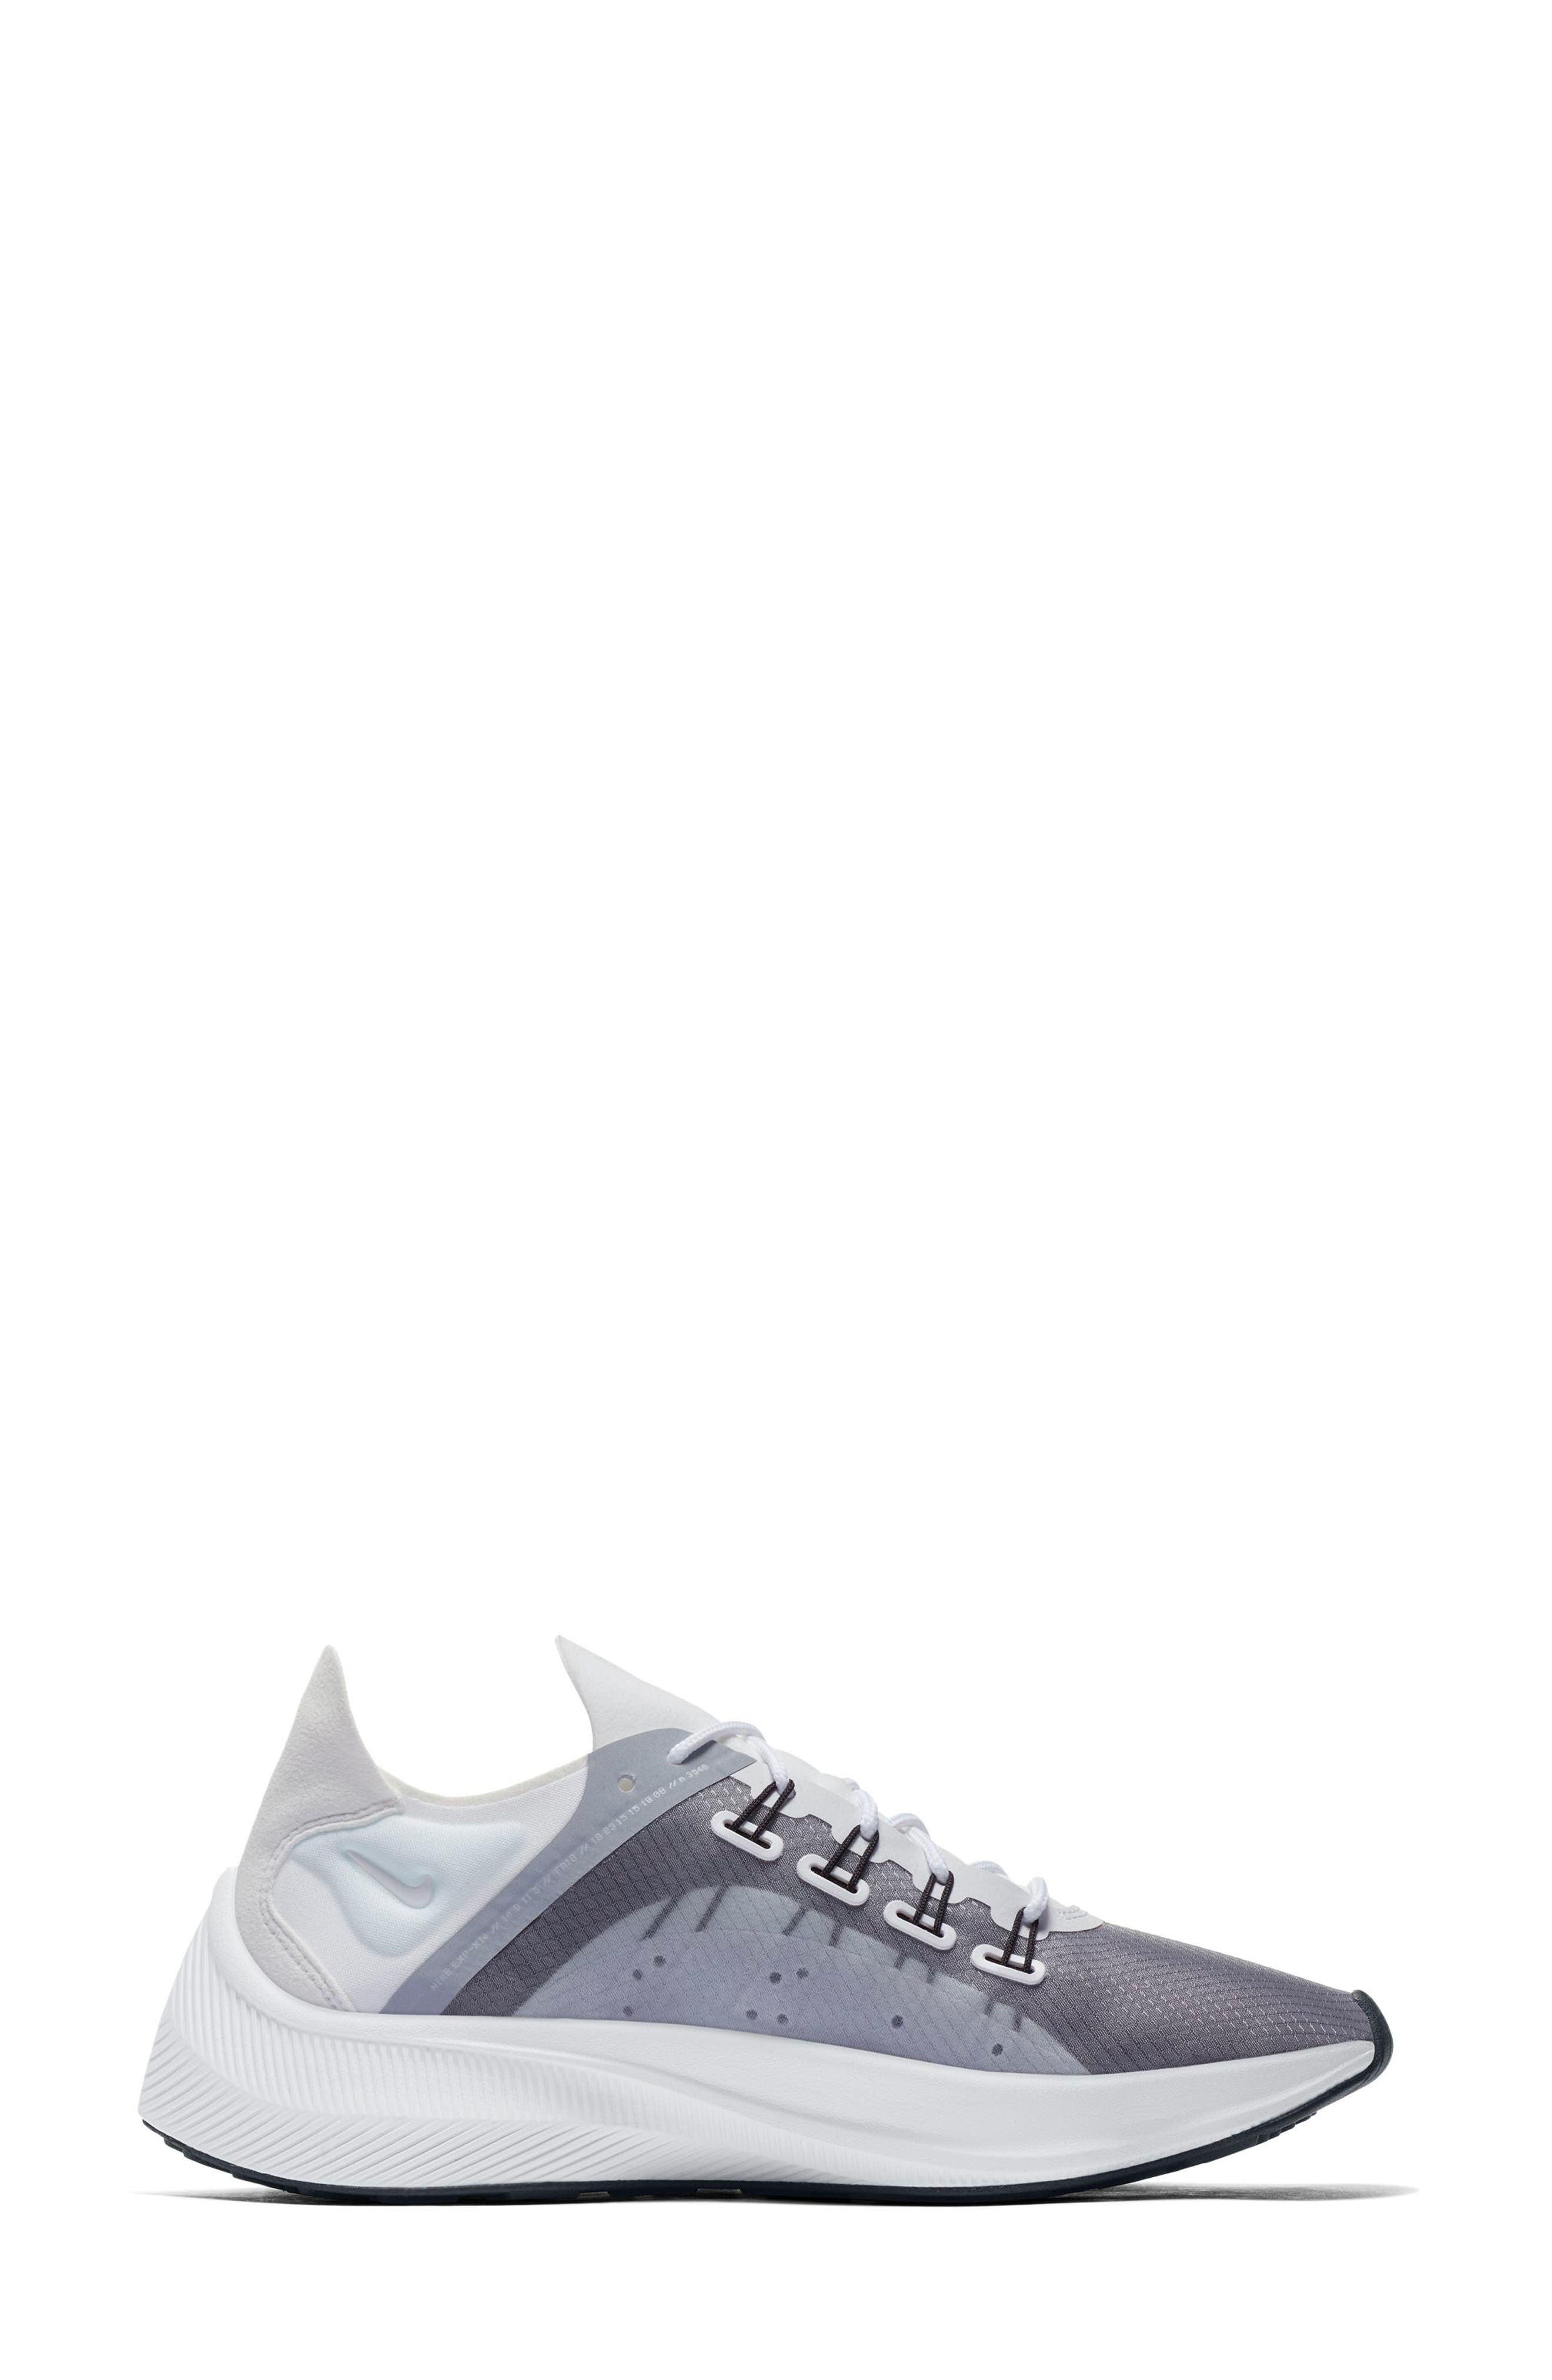 EXP-X14 Sneaker,                             Alternate thumbnail 3, color,                             WHITE/ WOLF GREY/ BLACK